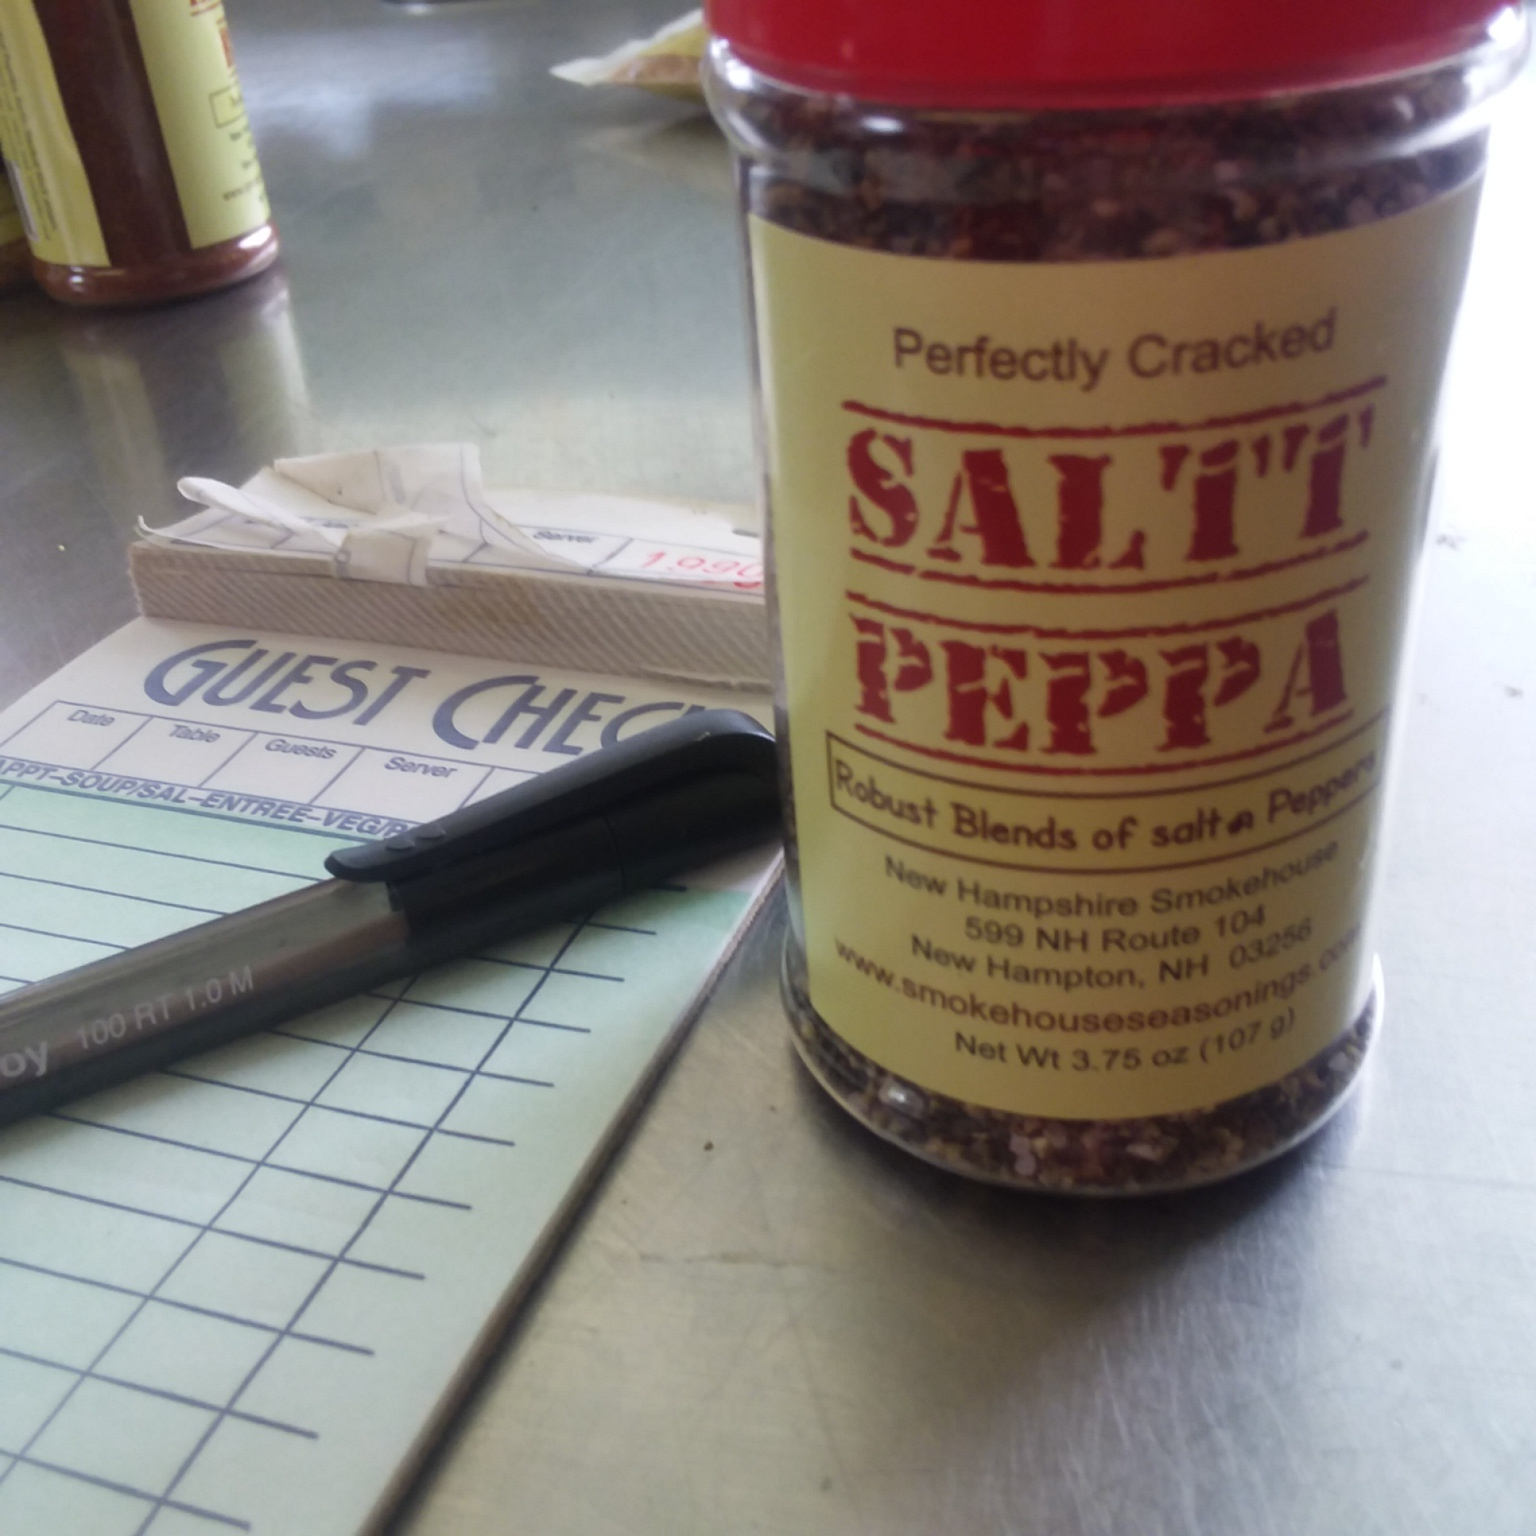 Saltt Peppa 24 Pack 3.75 free ship 31311